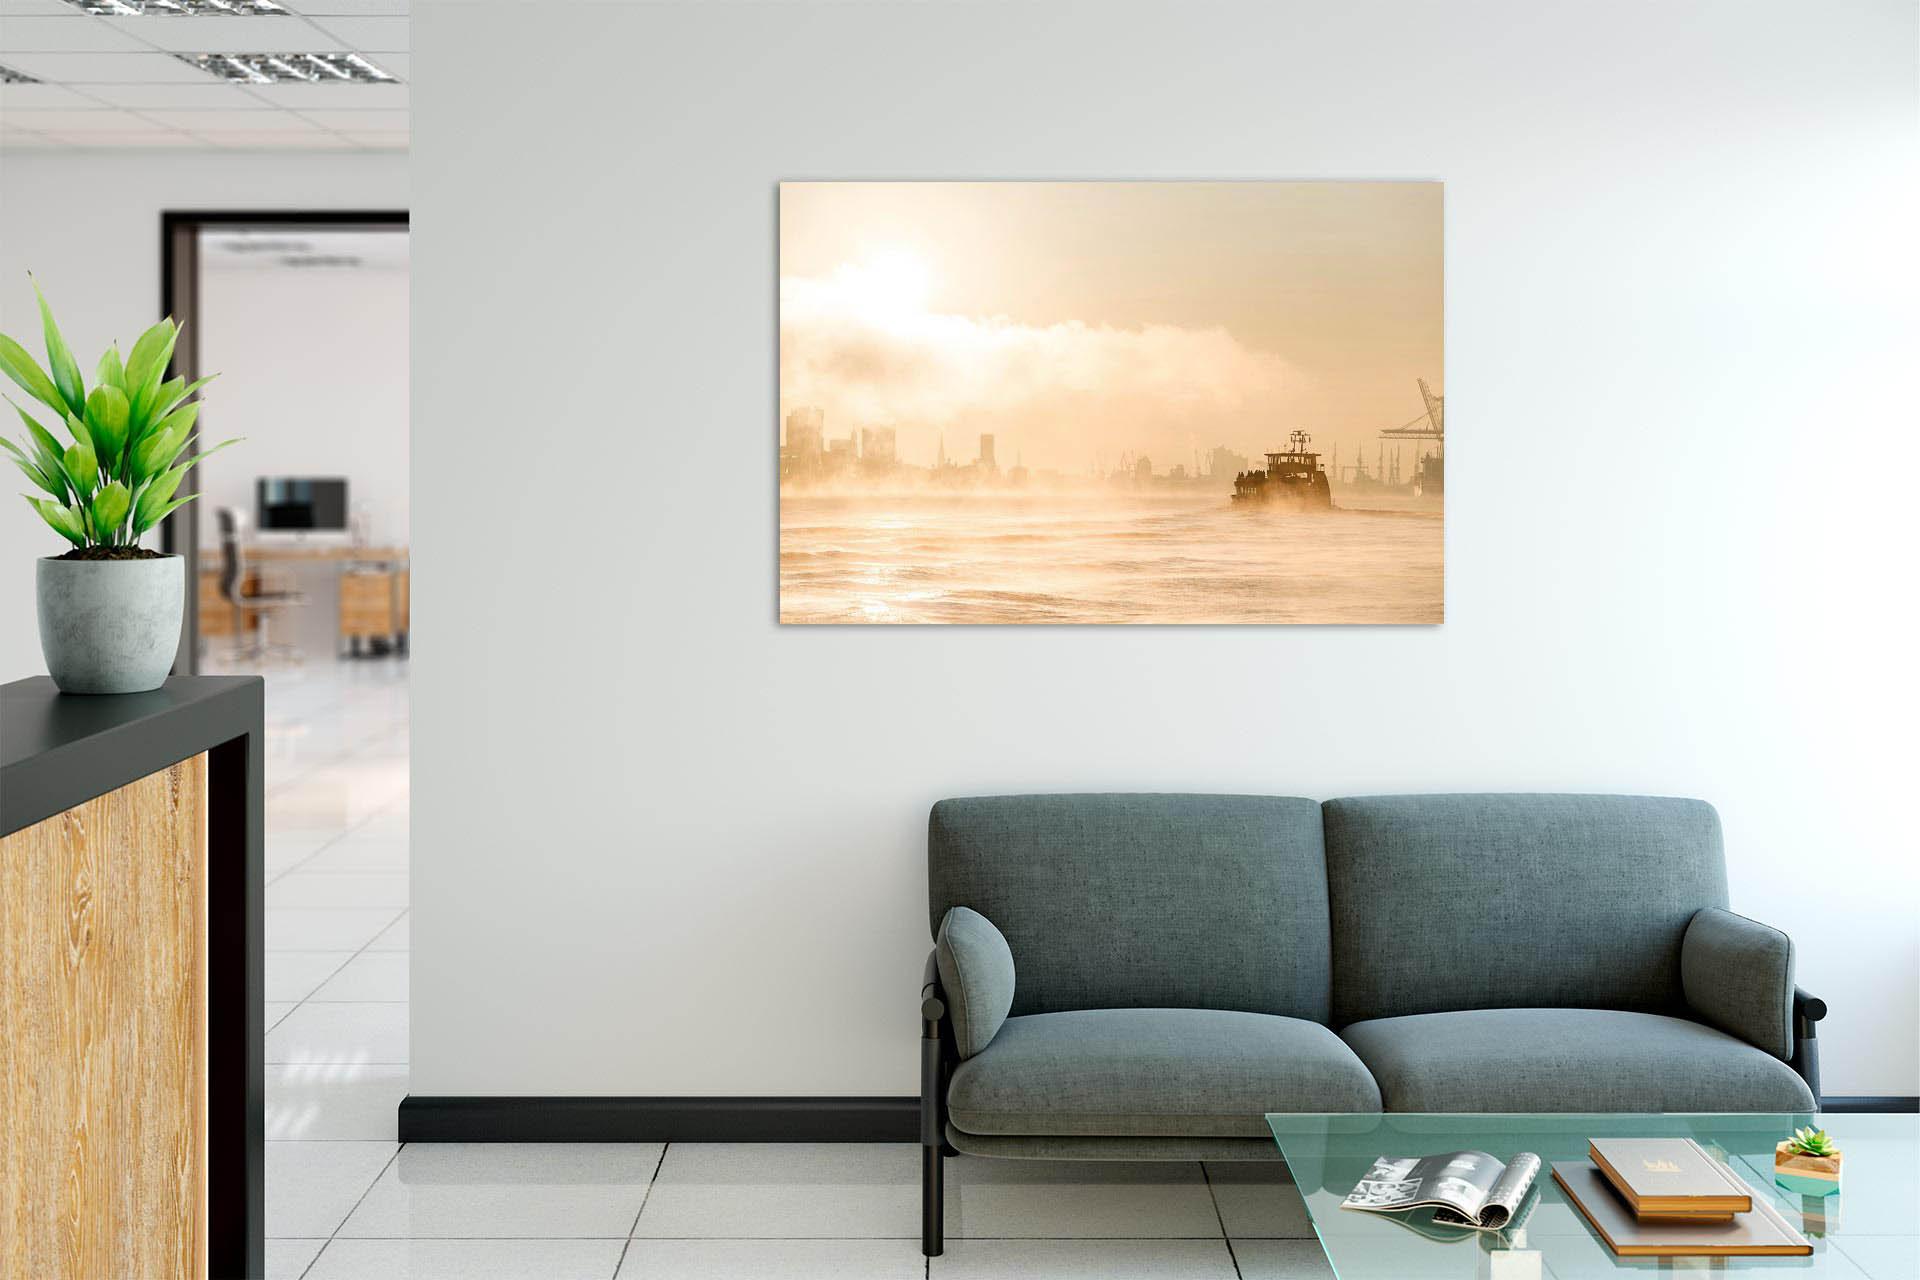 LCW209-nebel-elbe-hamburg-wandbild-bild-auf-leinwand-acrylglas-aludibond-empfang